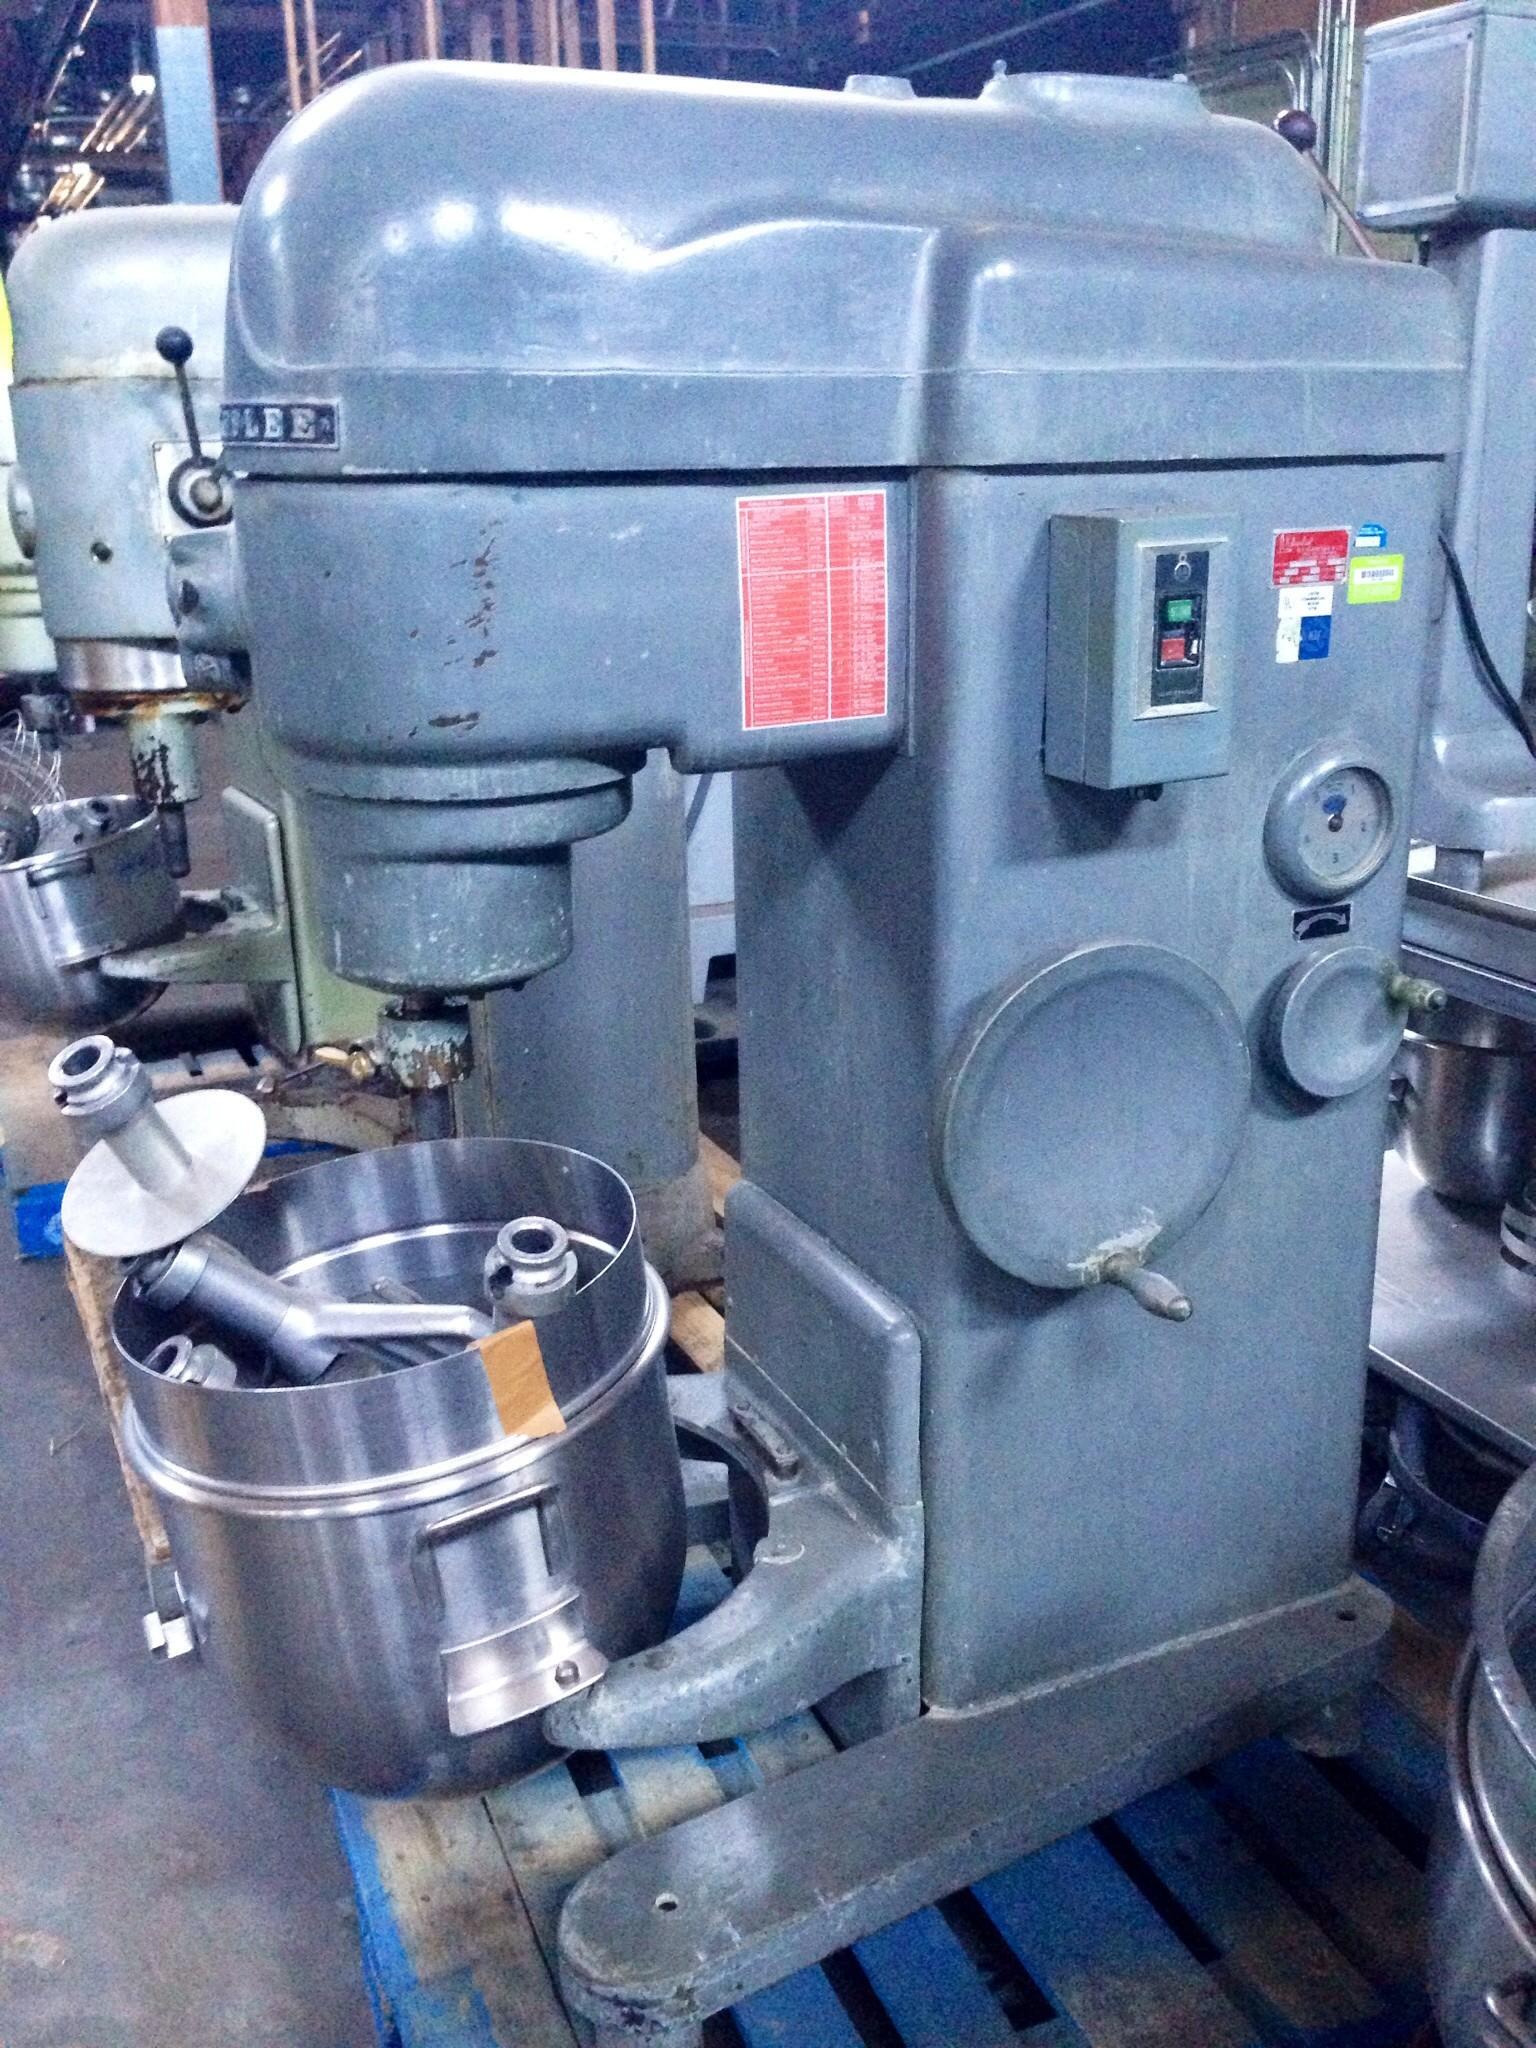 Blakeslee 60qrt Mixer - Restaurant Equipment